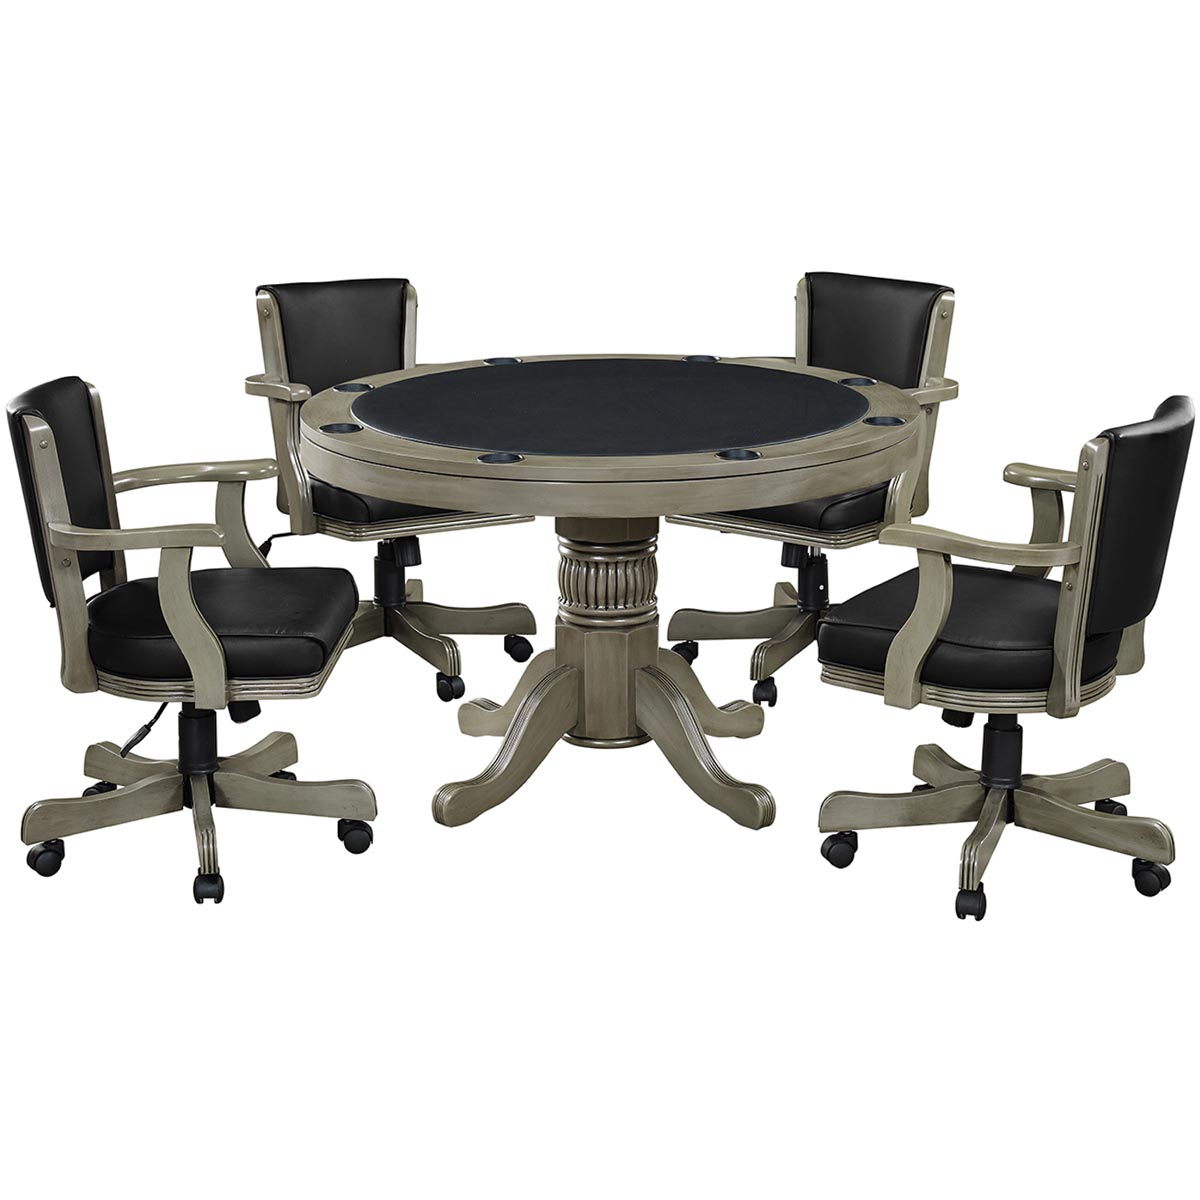 Slate Finish with Optional Swivel Chairs